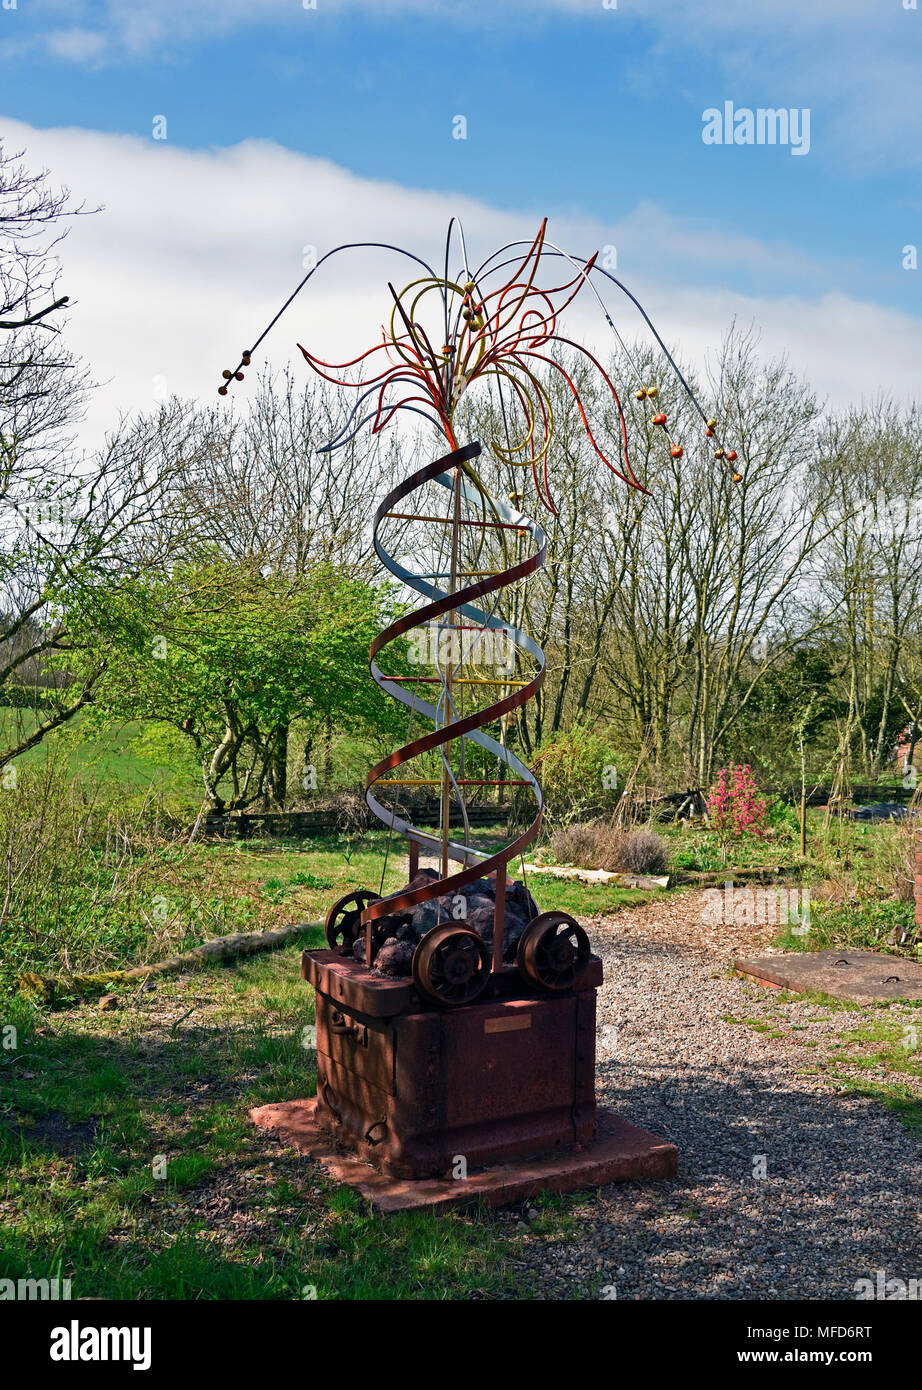 'Regeneration', outdoor sculpture. Florence Arts Centre. Egremont, Cumbria, England, United Kingdom, Europe. - Stock Image